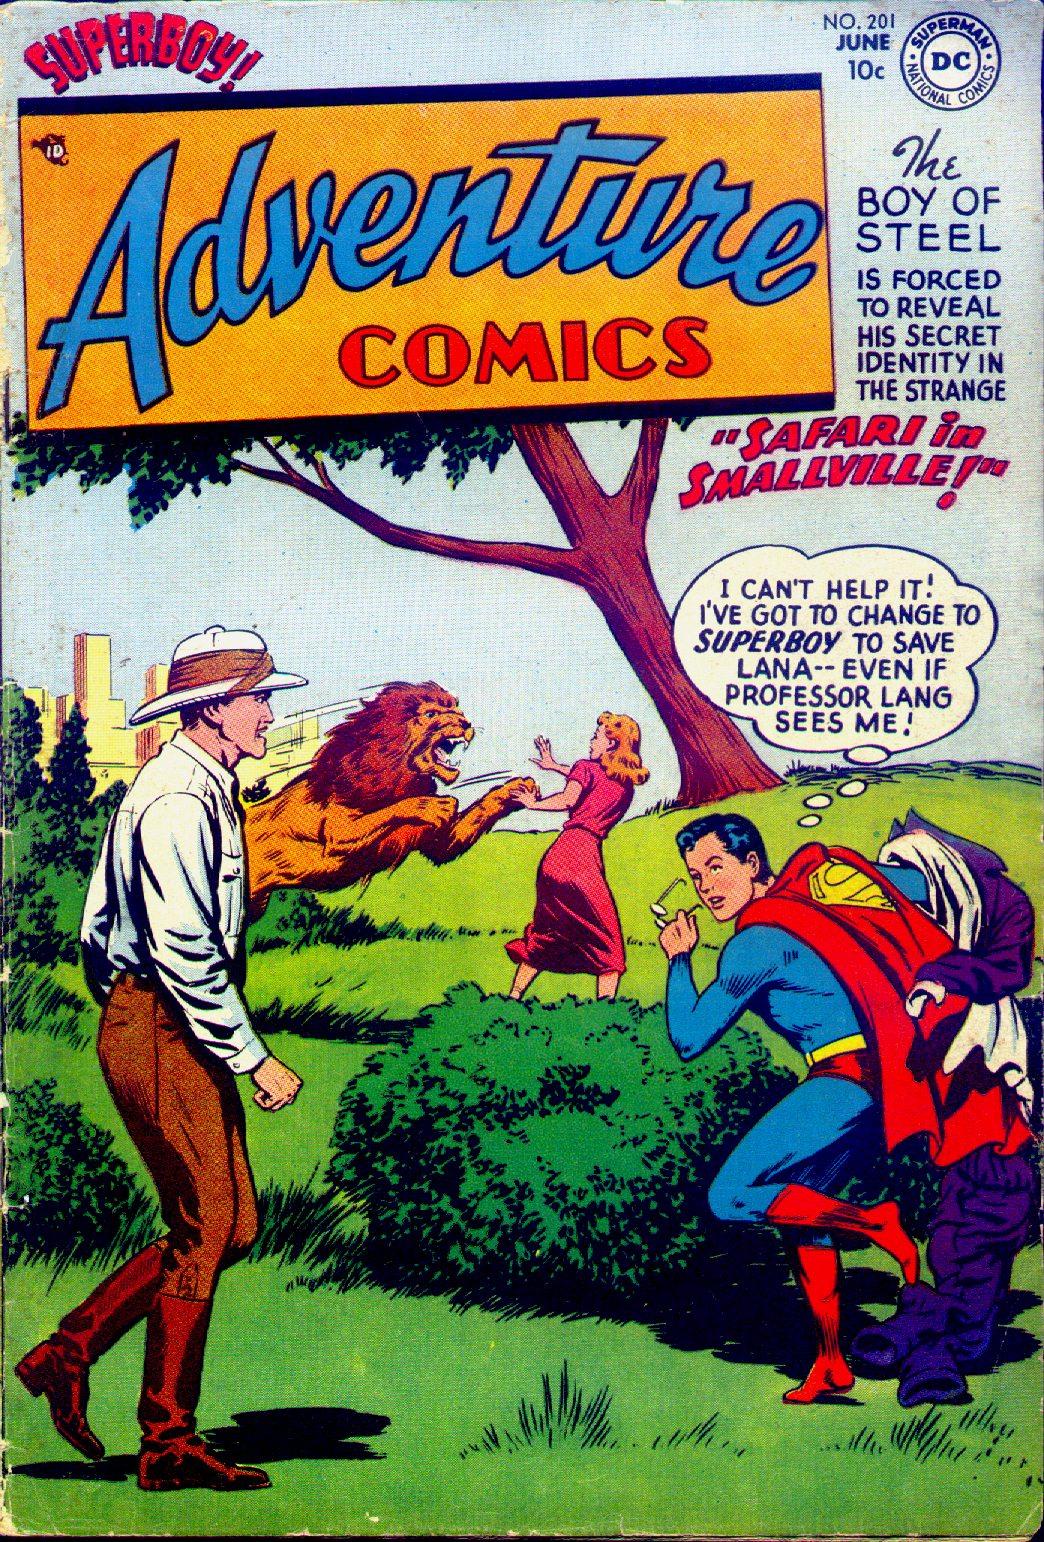 Read online Adventure Comics (1938) comic -  Issue #201 - 1